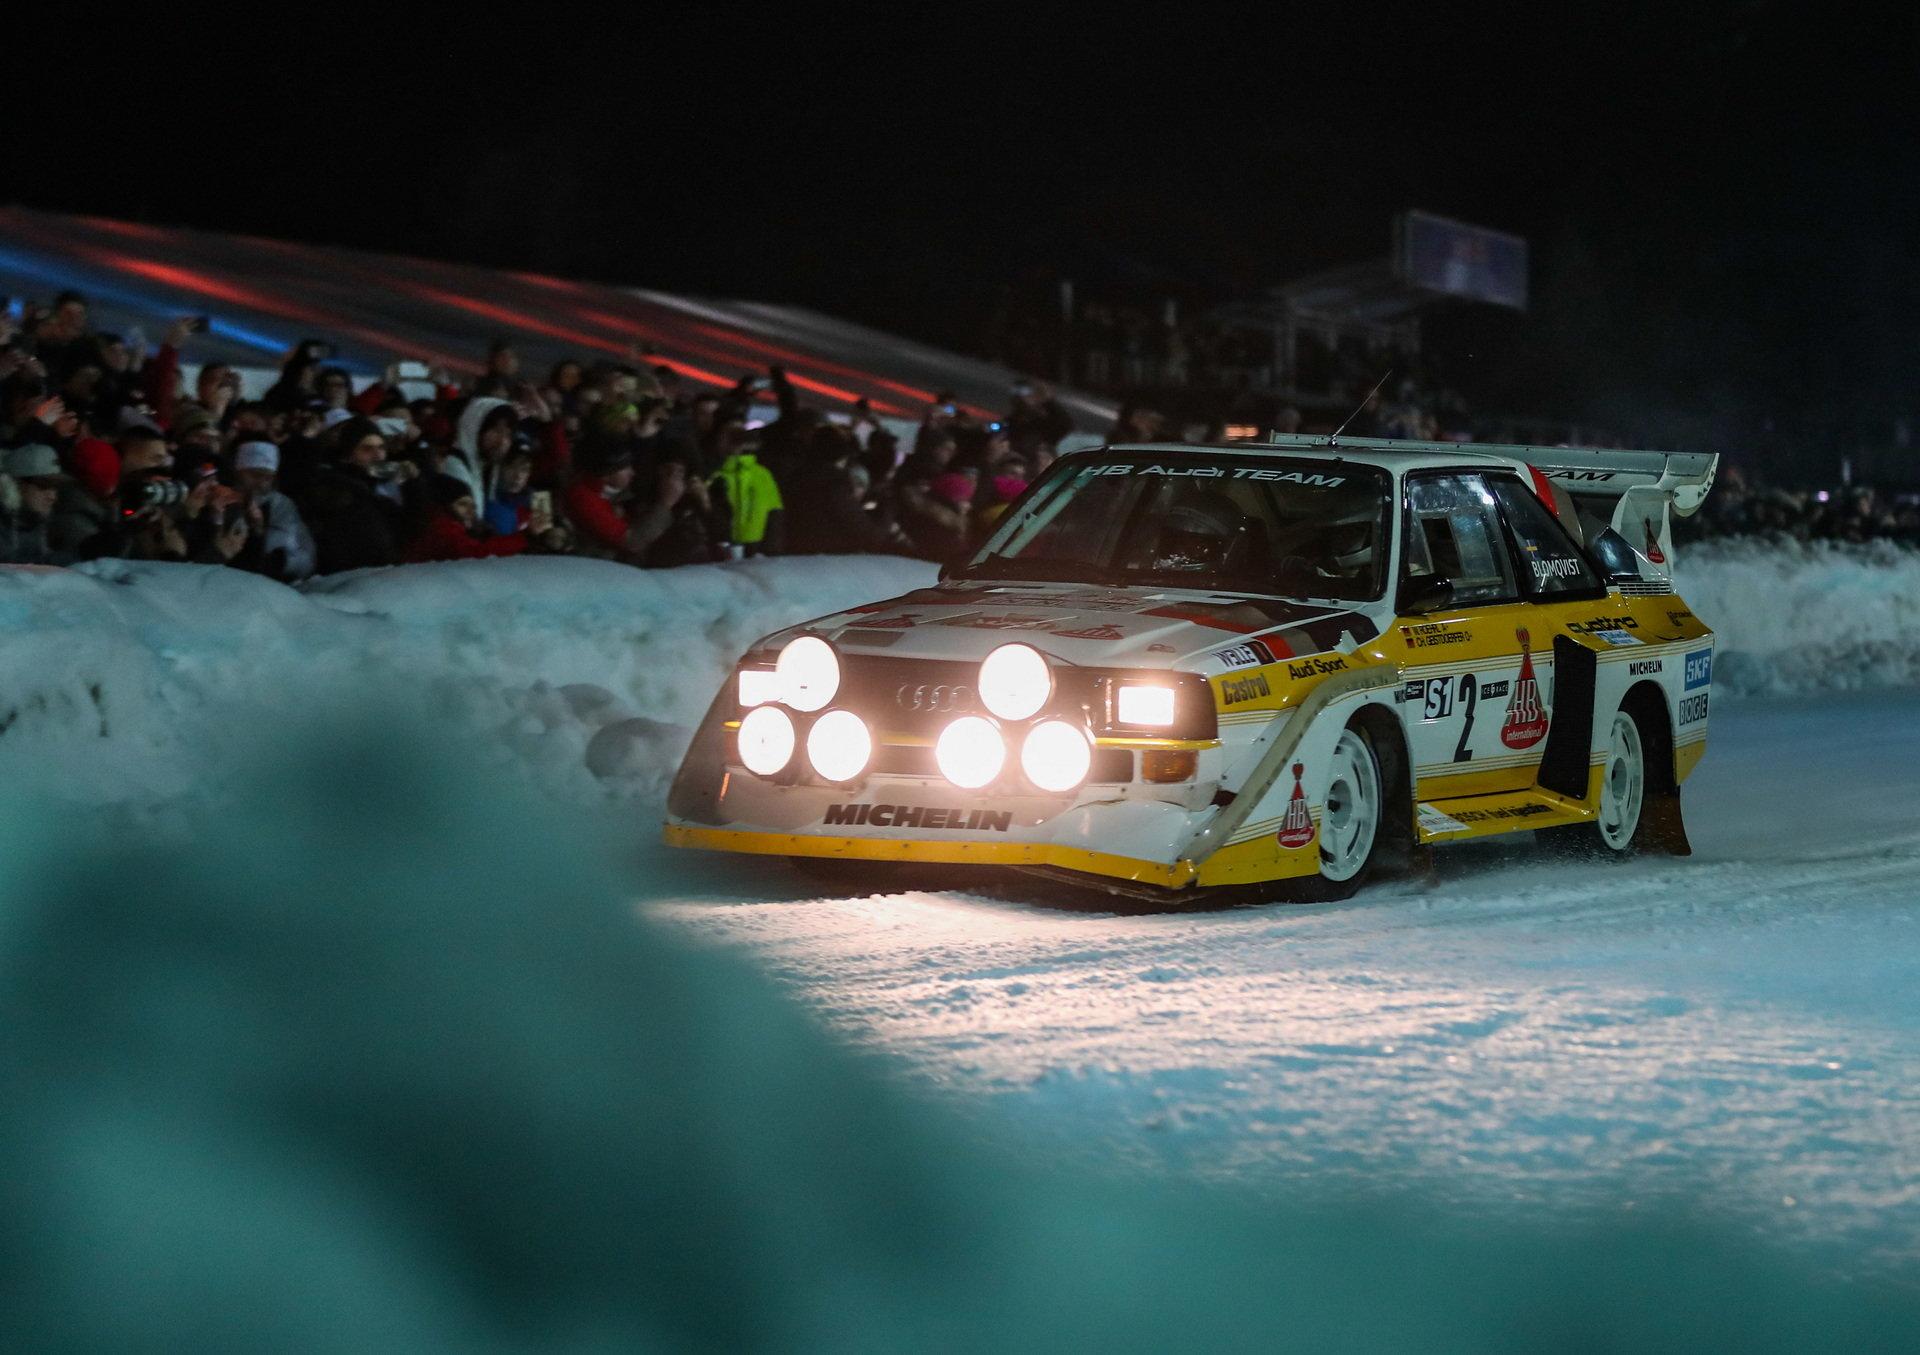 1985-Audi-Sport-Quattro-S1-E2-4.jpg